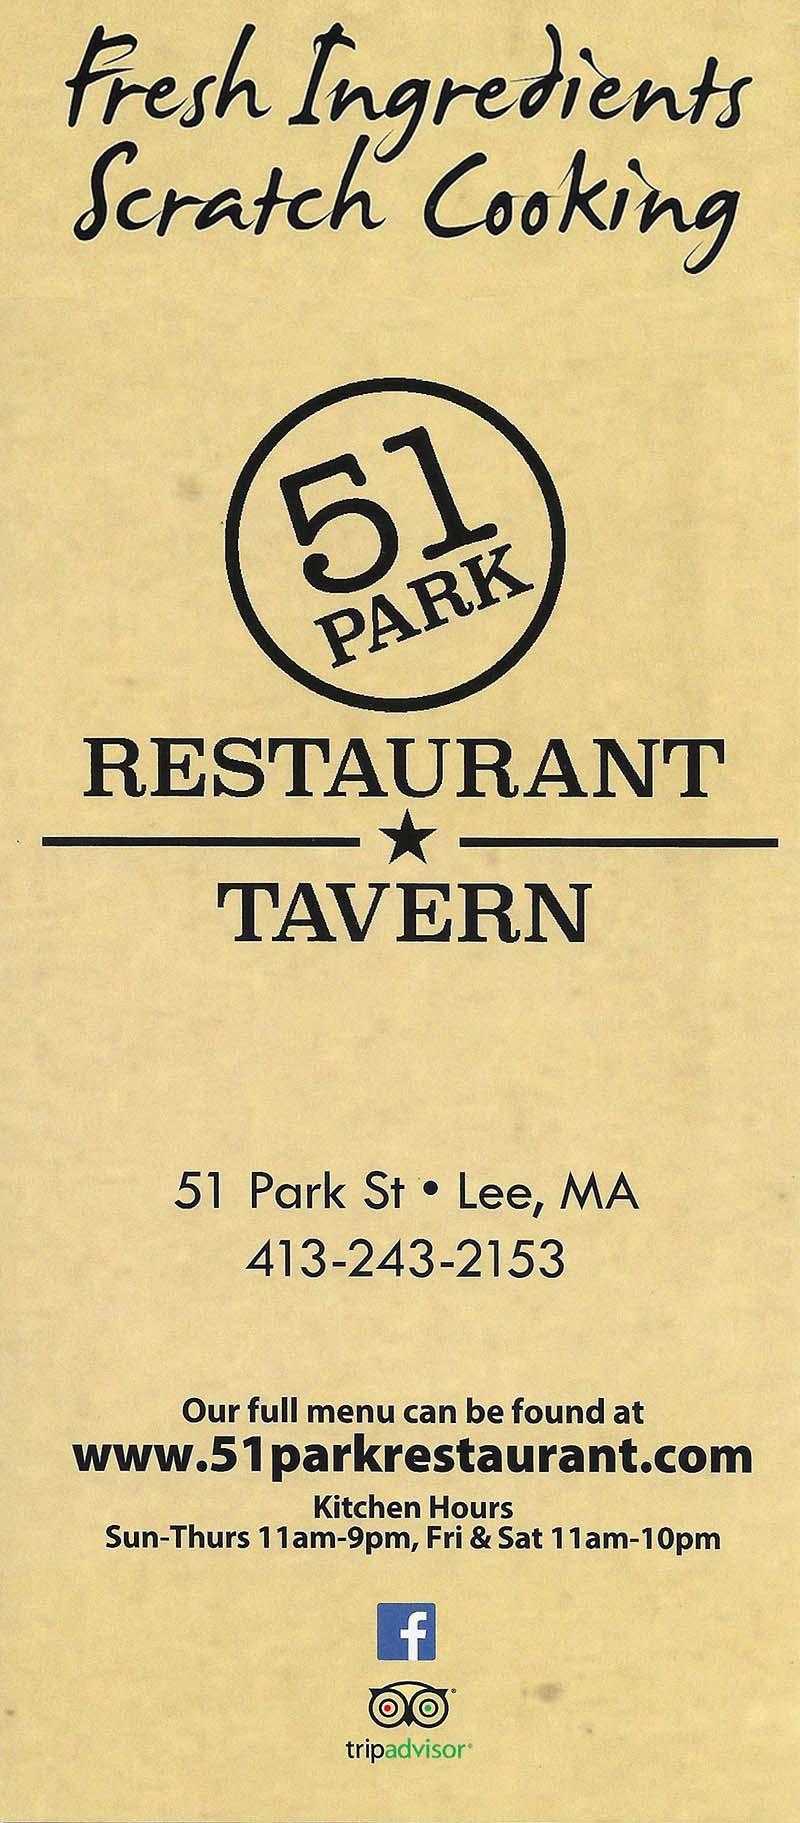 51 Park